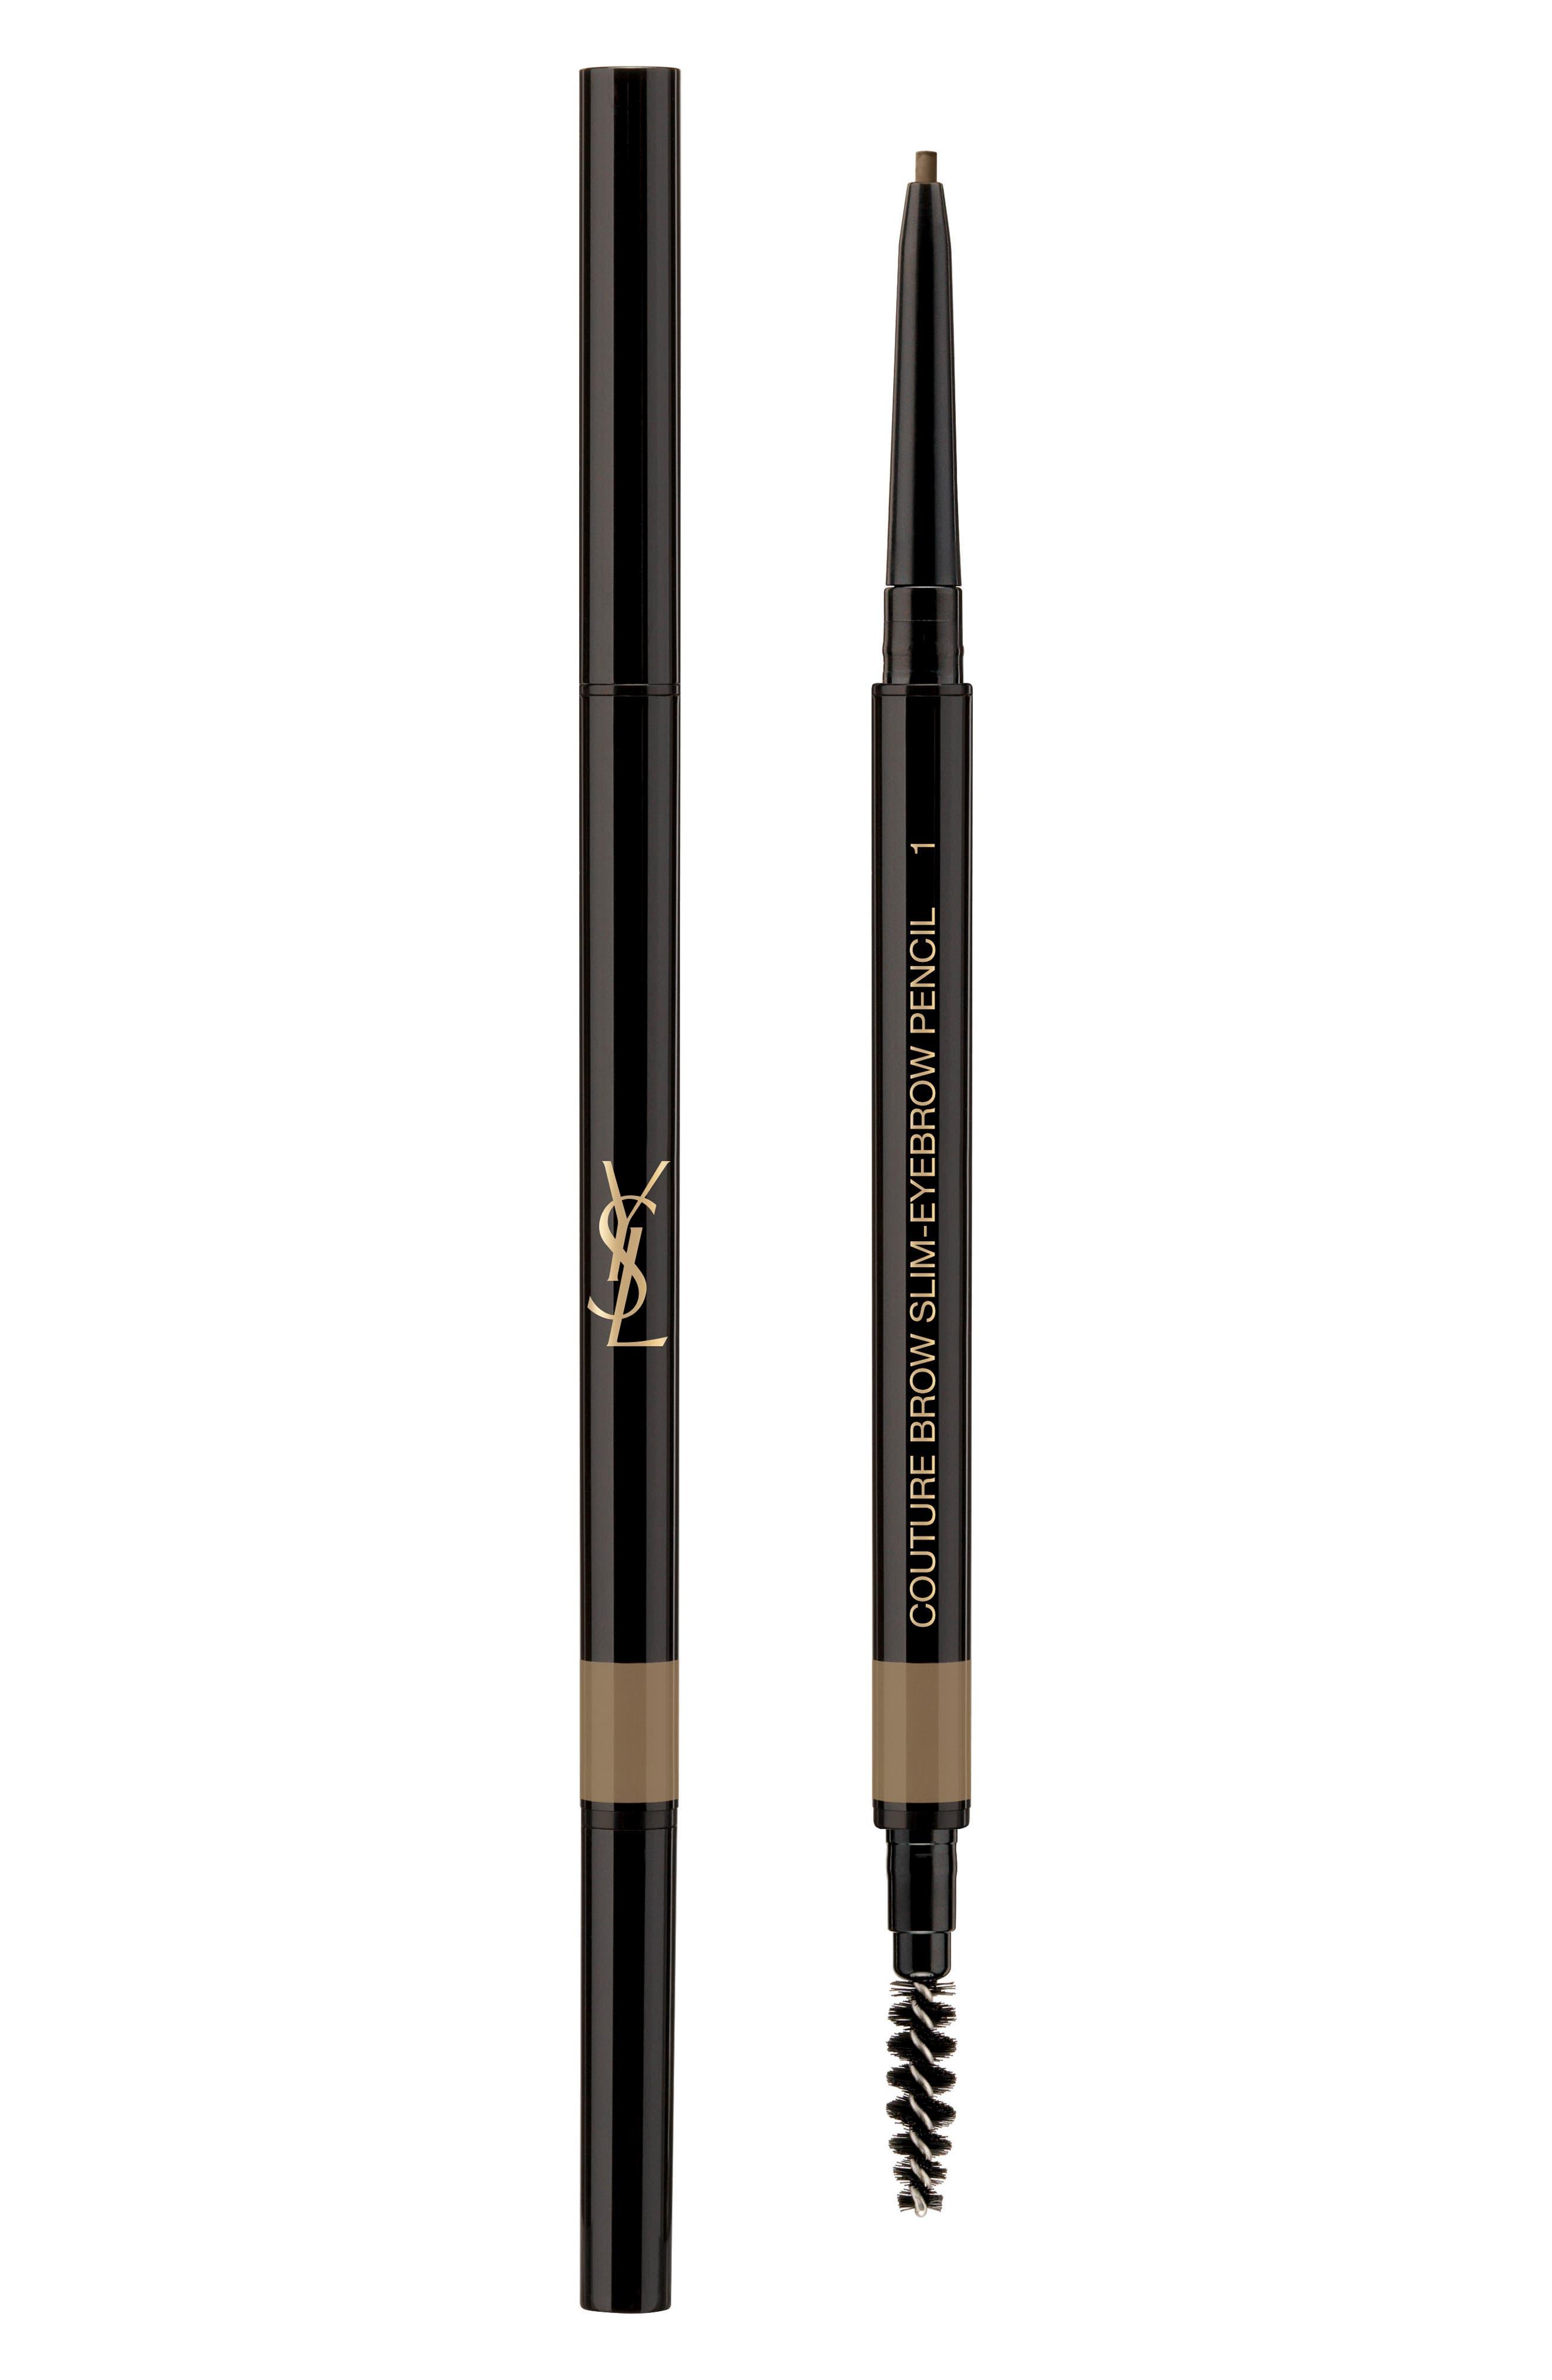 Yves Saint Laurent Couture Brow Slim Eyebrow Pencil -